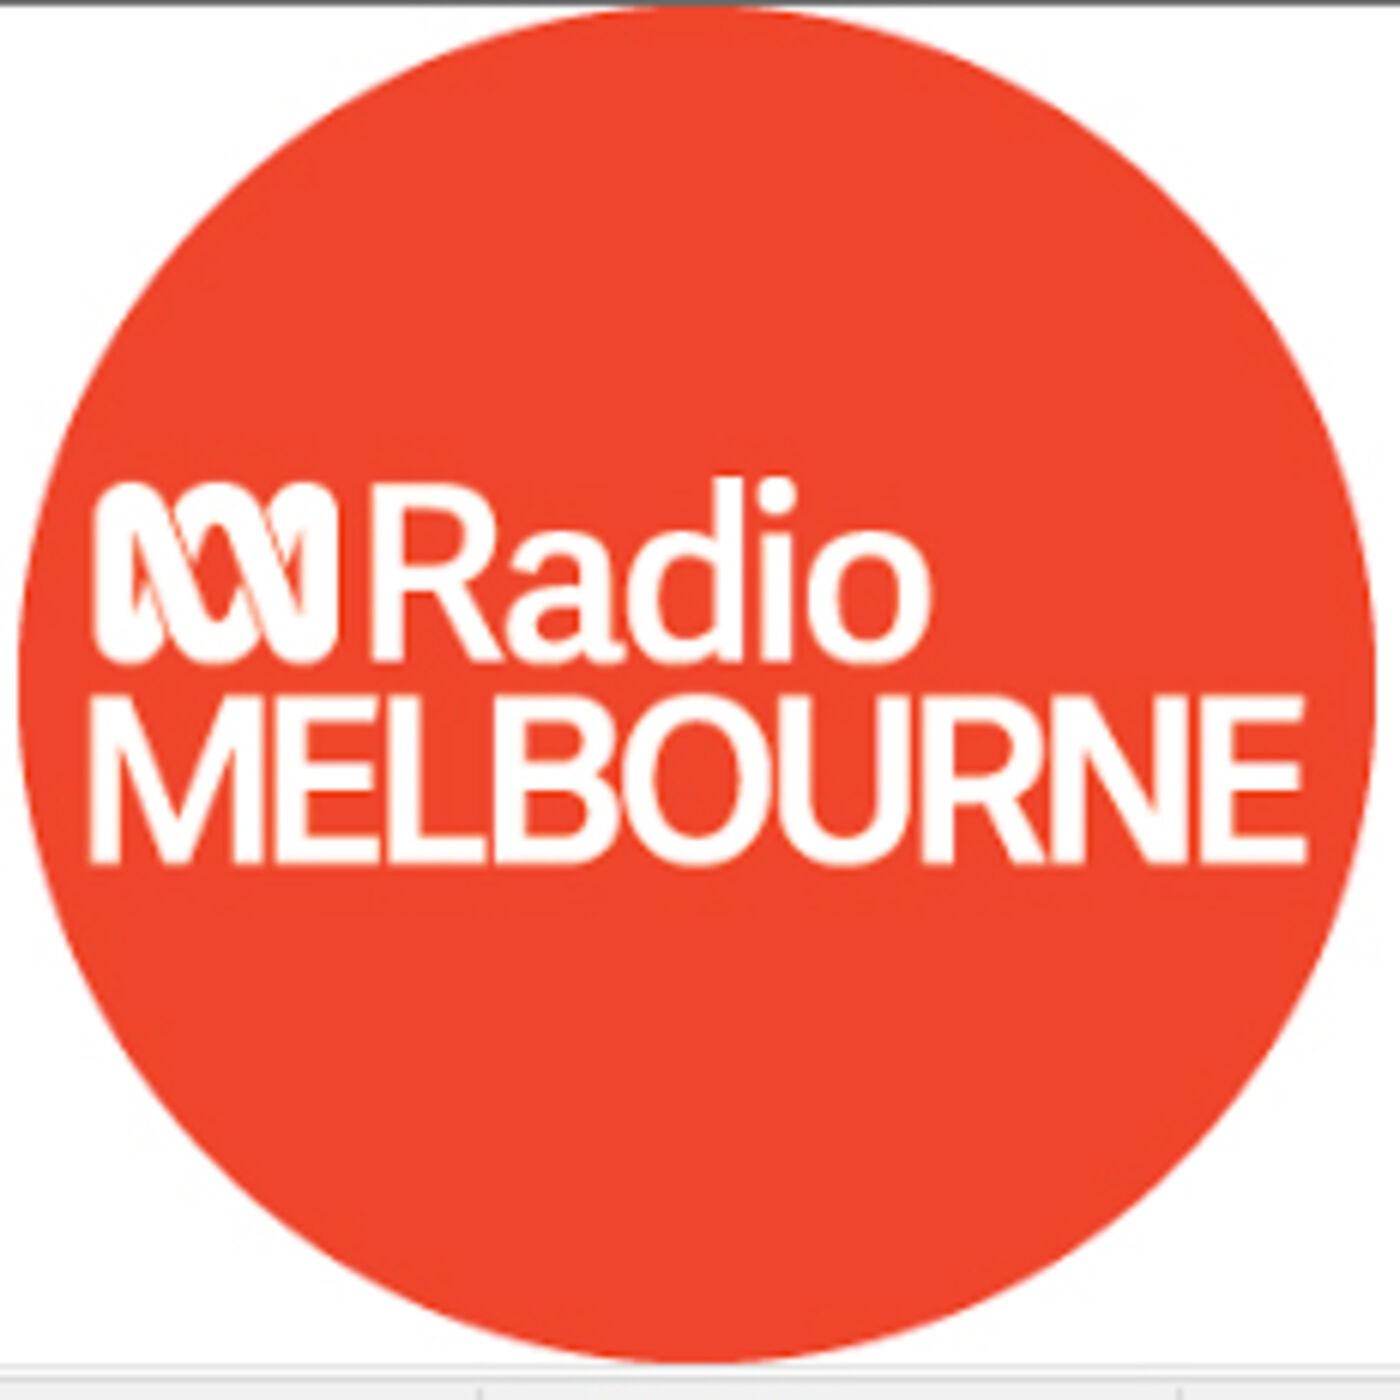 Princess Diana Museum - Renae Plant interview on ABC Radio with Libbi Gorr - Jan 16, 2021